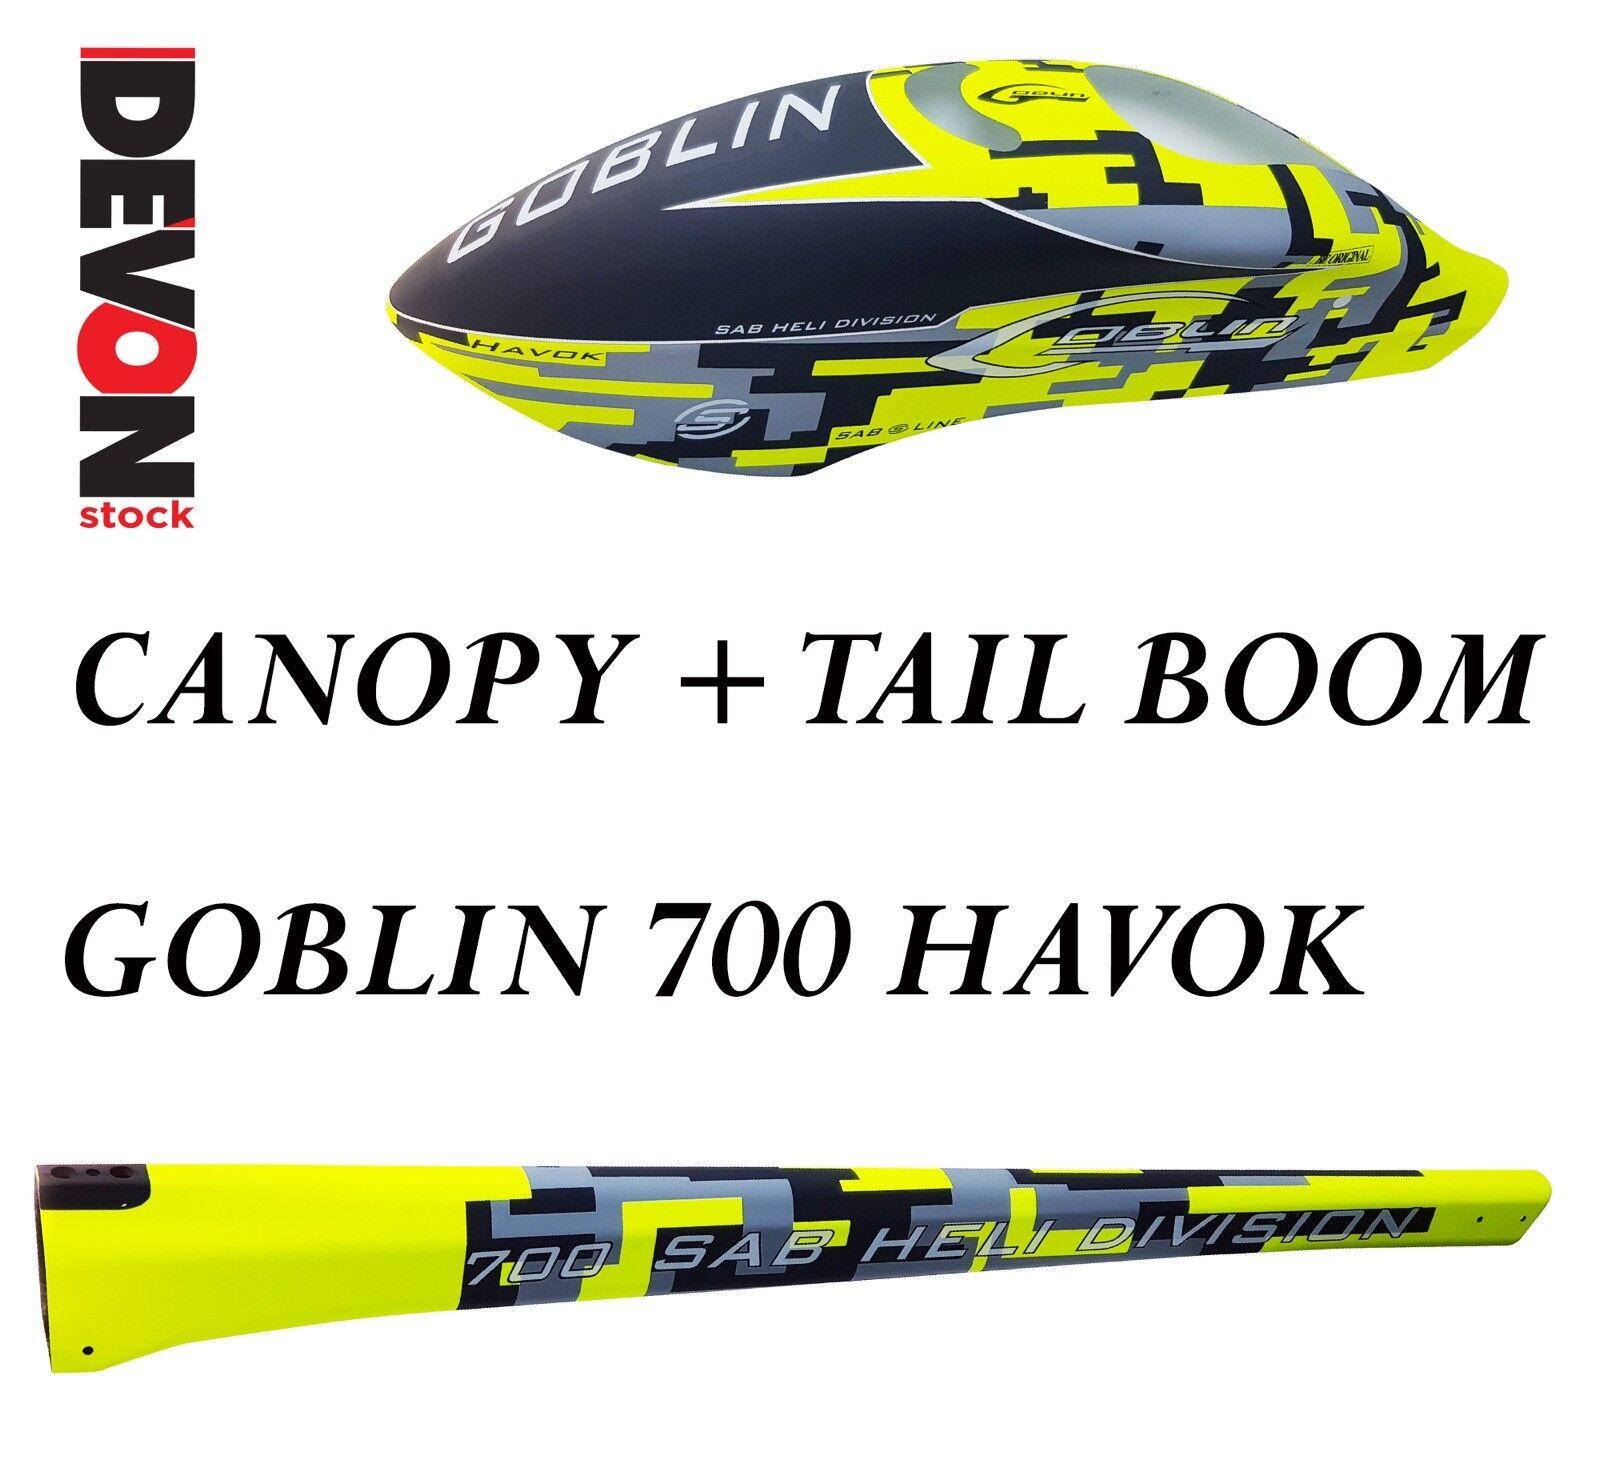 Canopy tail boom havok sab goblin 700 havok elicottero elettrico rc radiocomando